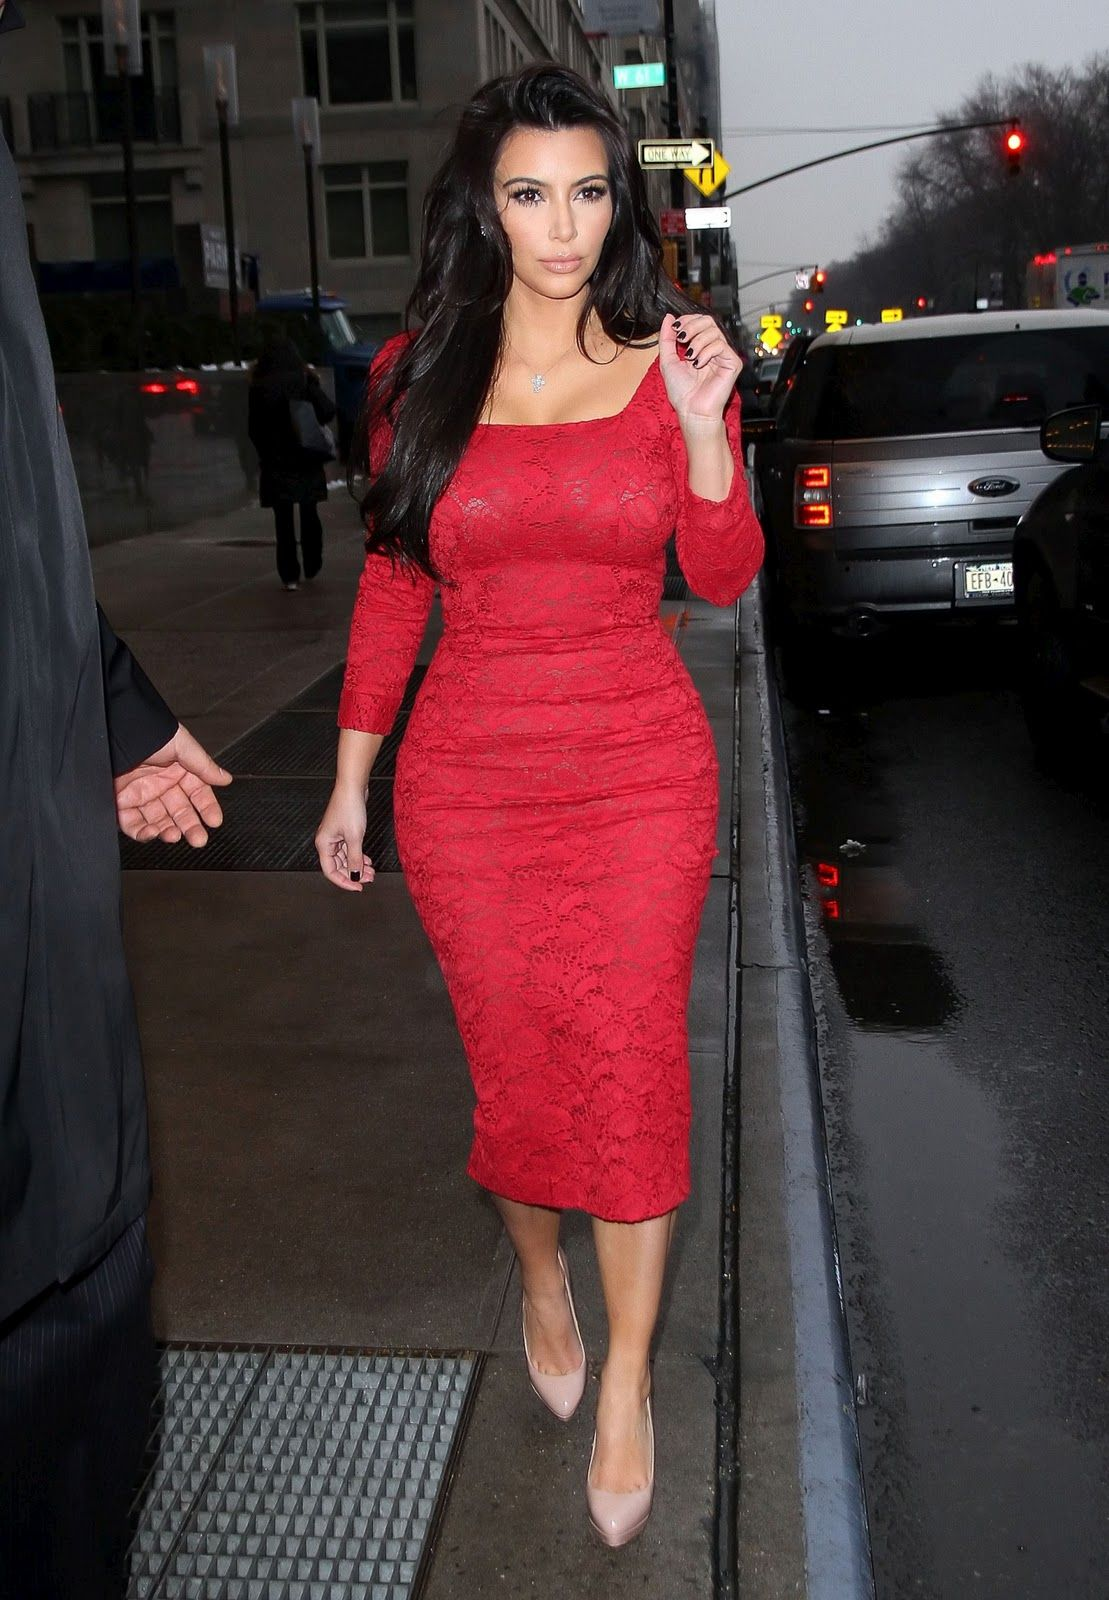 kim-kardashian-photoshoot-2012-2